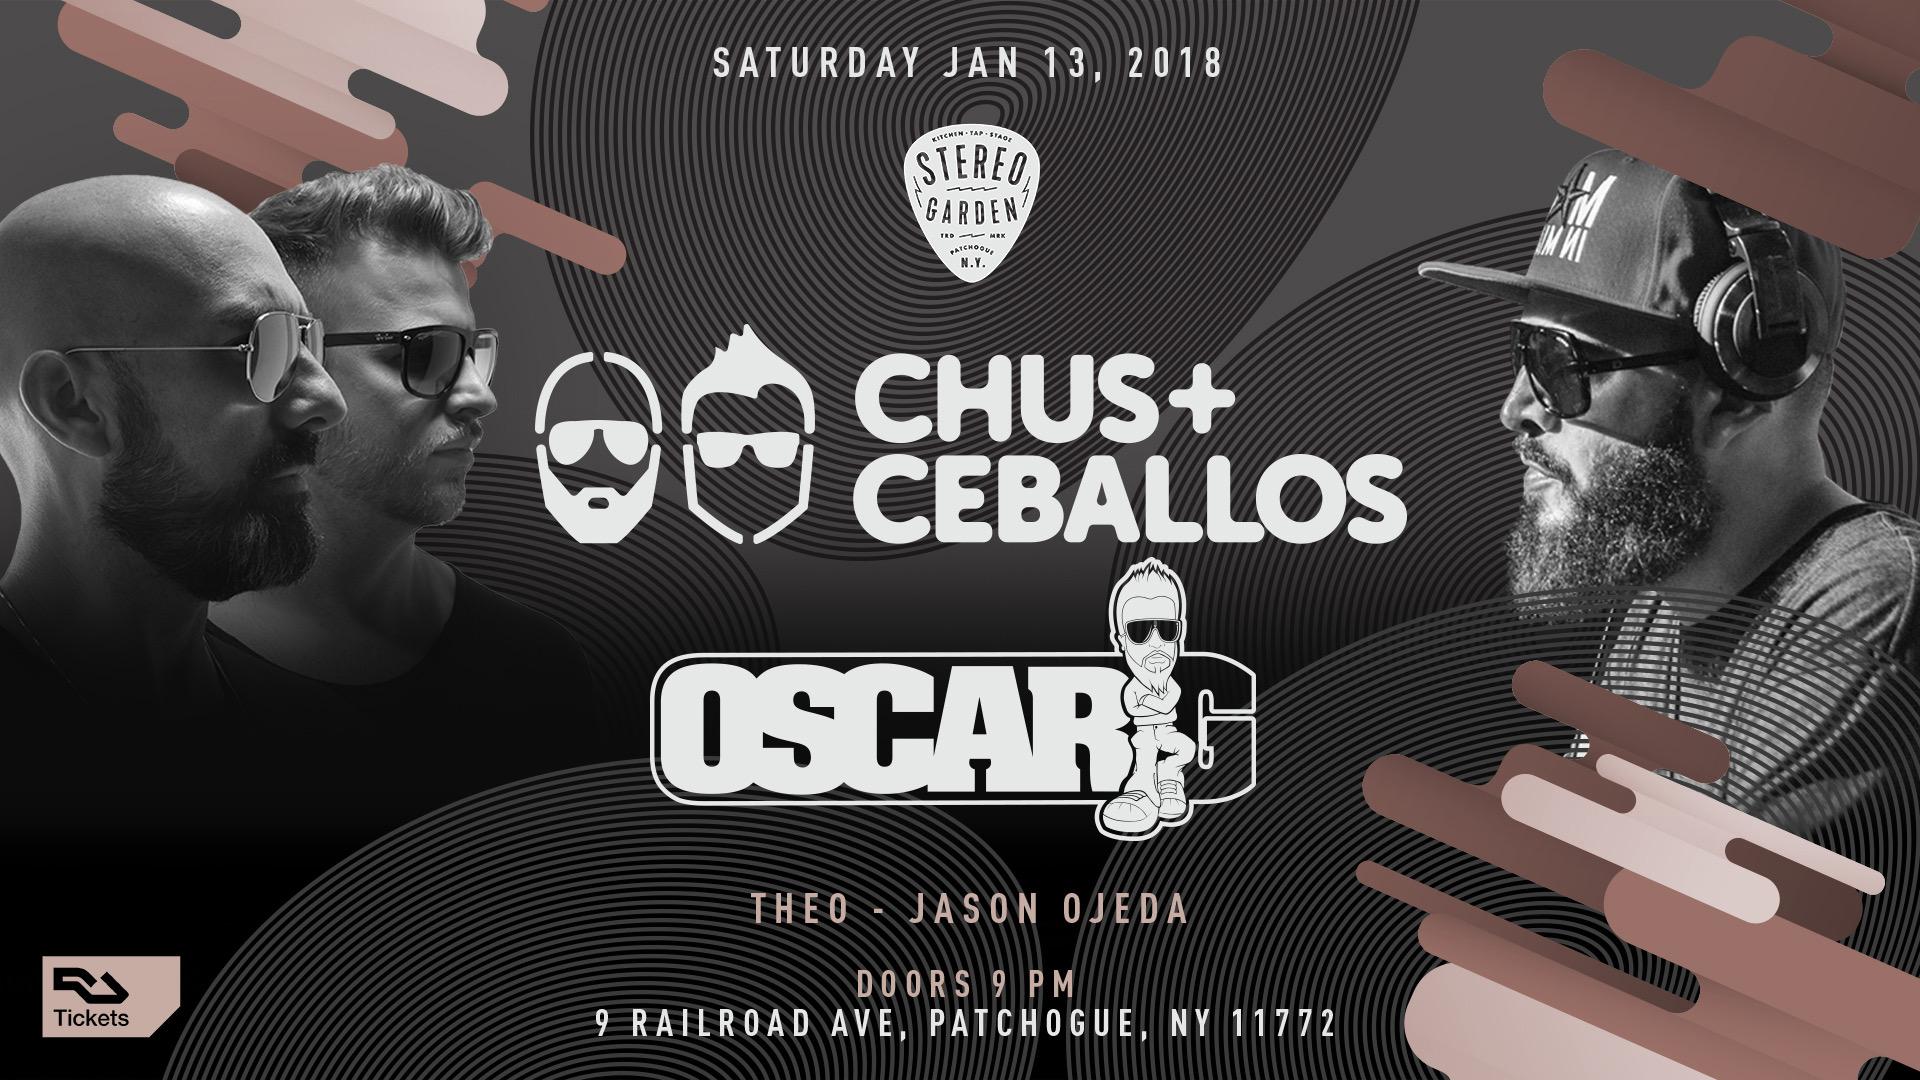 Chus+Ceballos Oscar G Benny Soto Mike Nervous Robbie Lumpkin Promotions